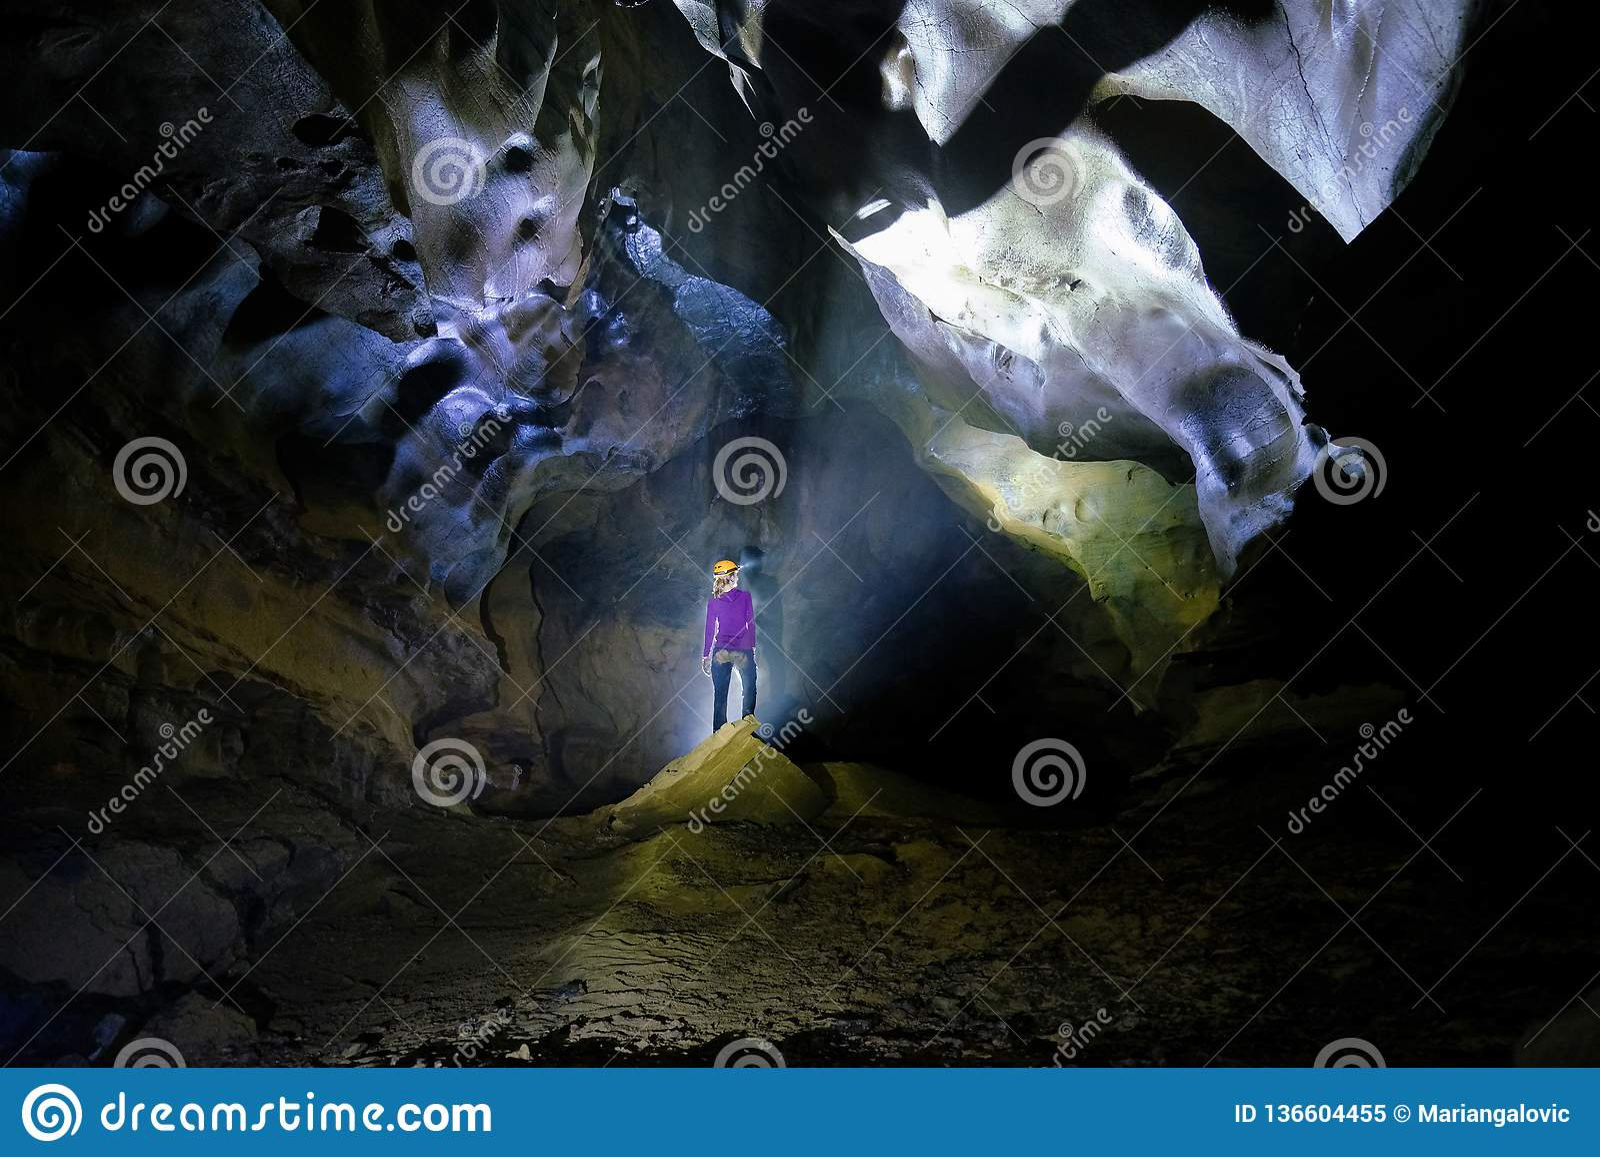 Phong Nha Ke national park / Vietnam, 15/11/2017: Backlit woman standing on a rock inside the Hang Tien cave in the Phong Nha Ke